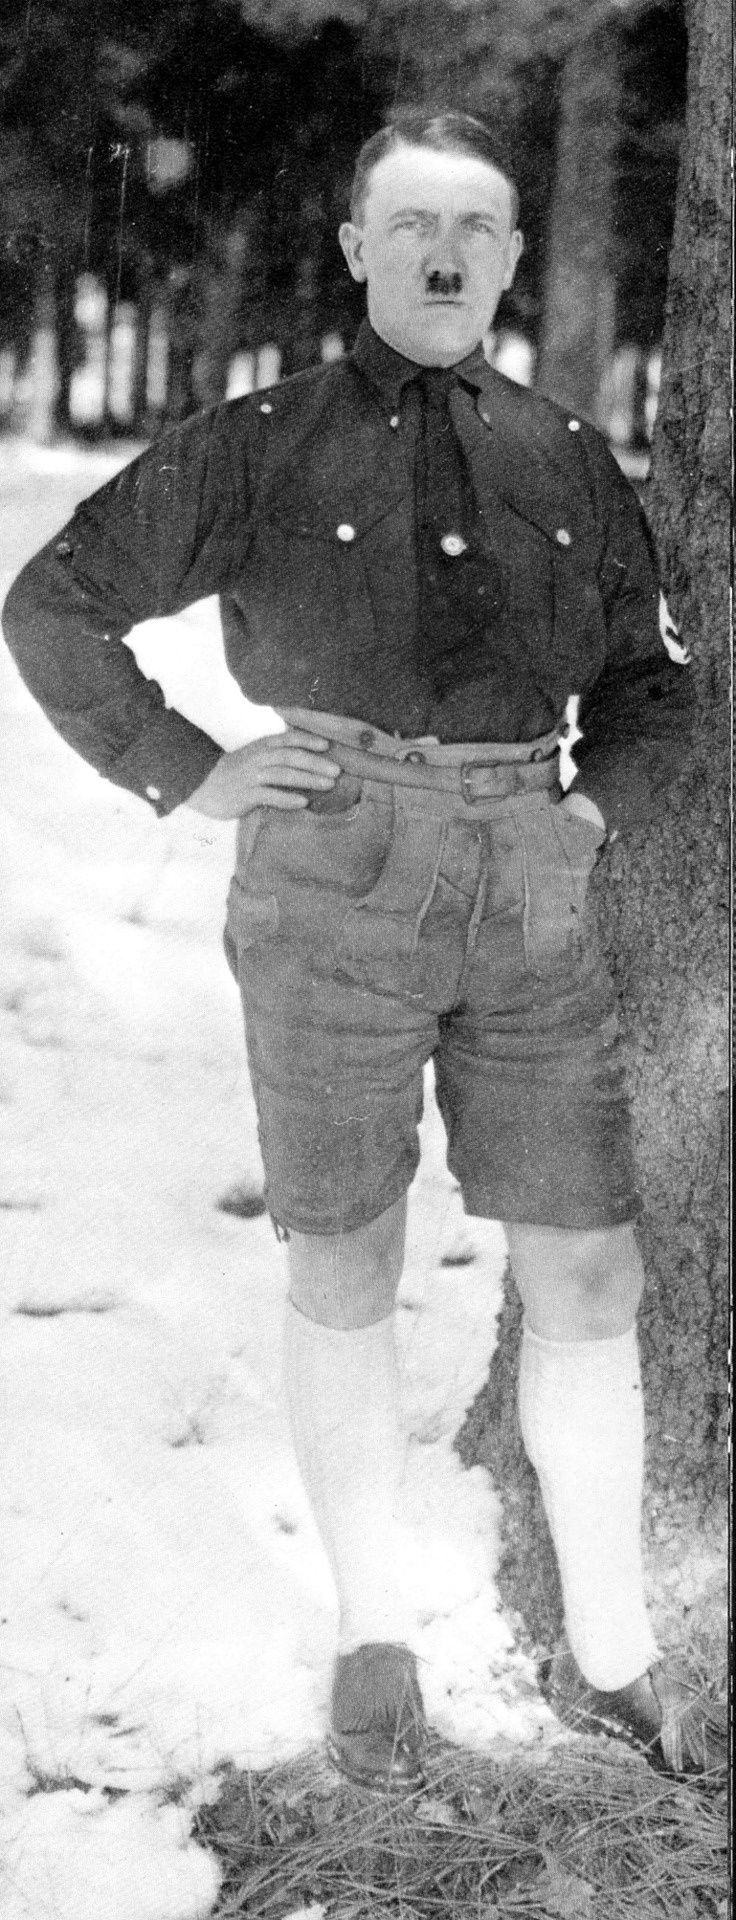 a short recount of the life of adolf hitler Birthday adolf hitler was born in braunau am inn, austria, on april 20, 1889 family the fourth of six children, adolf hitler was born to alois hitler and klara polzl.